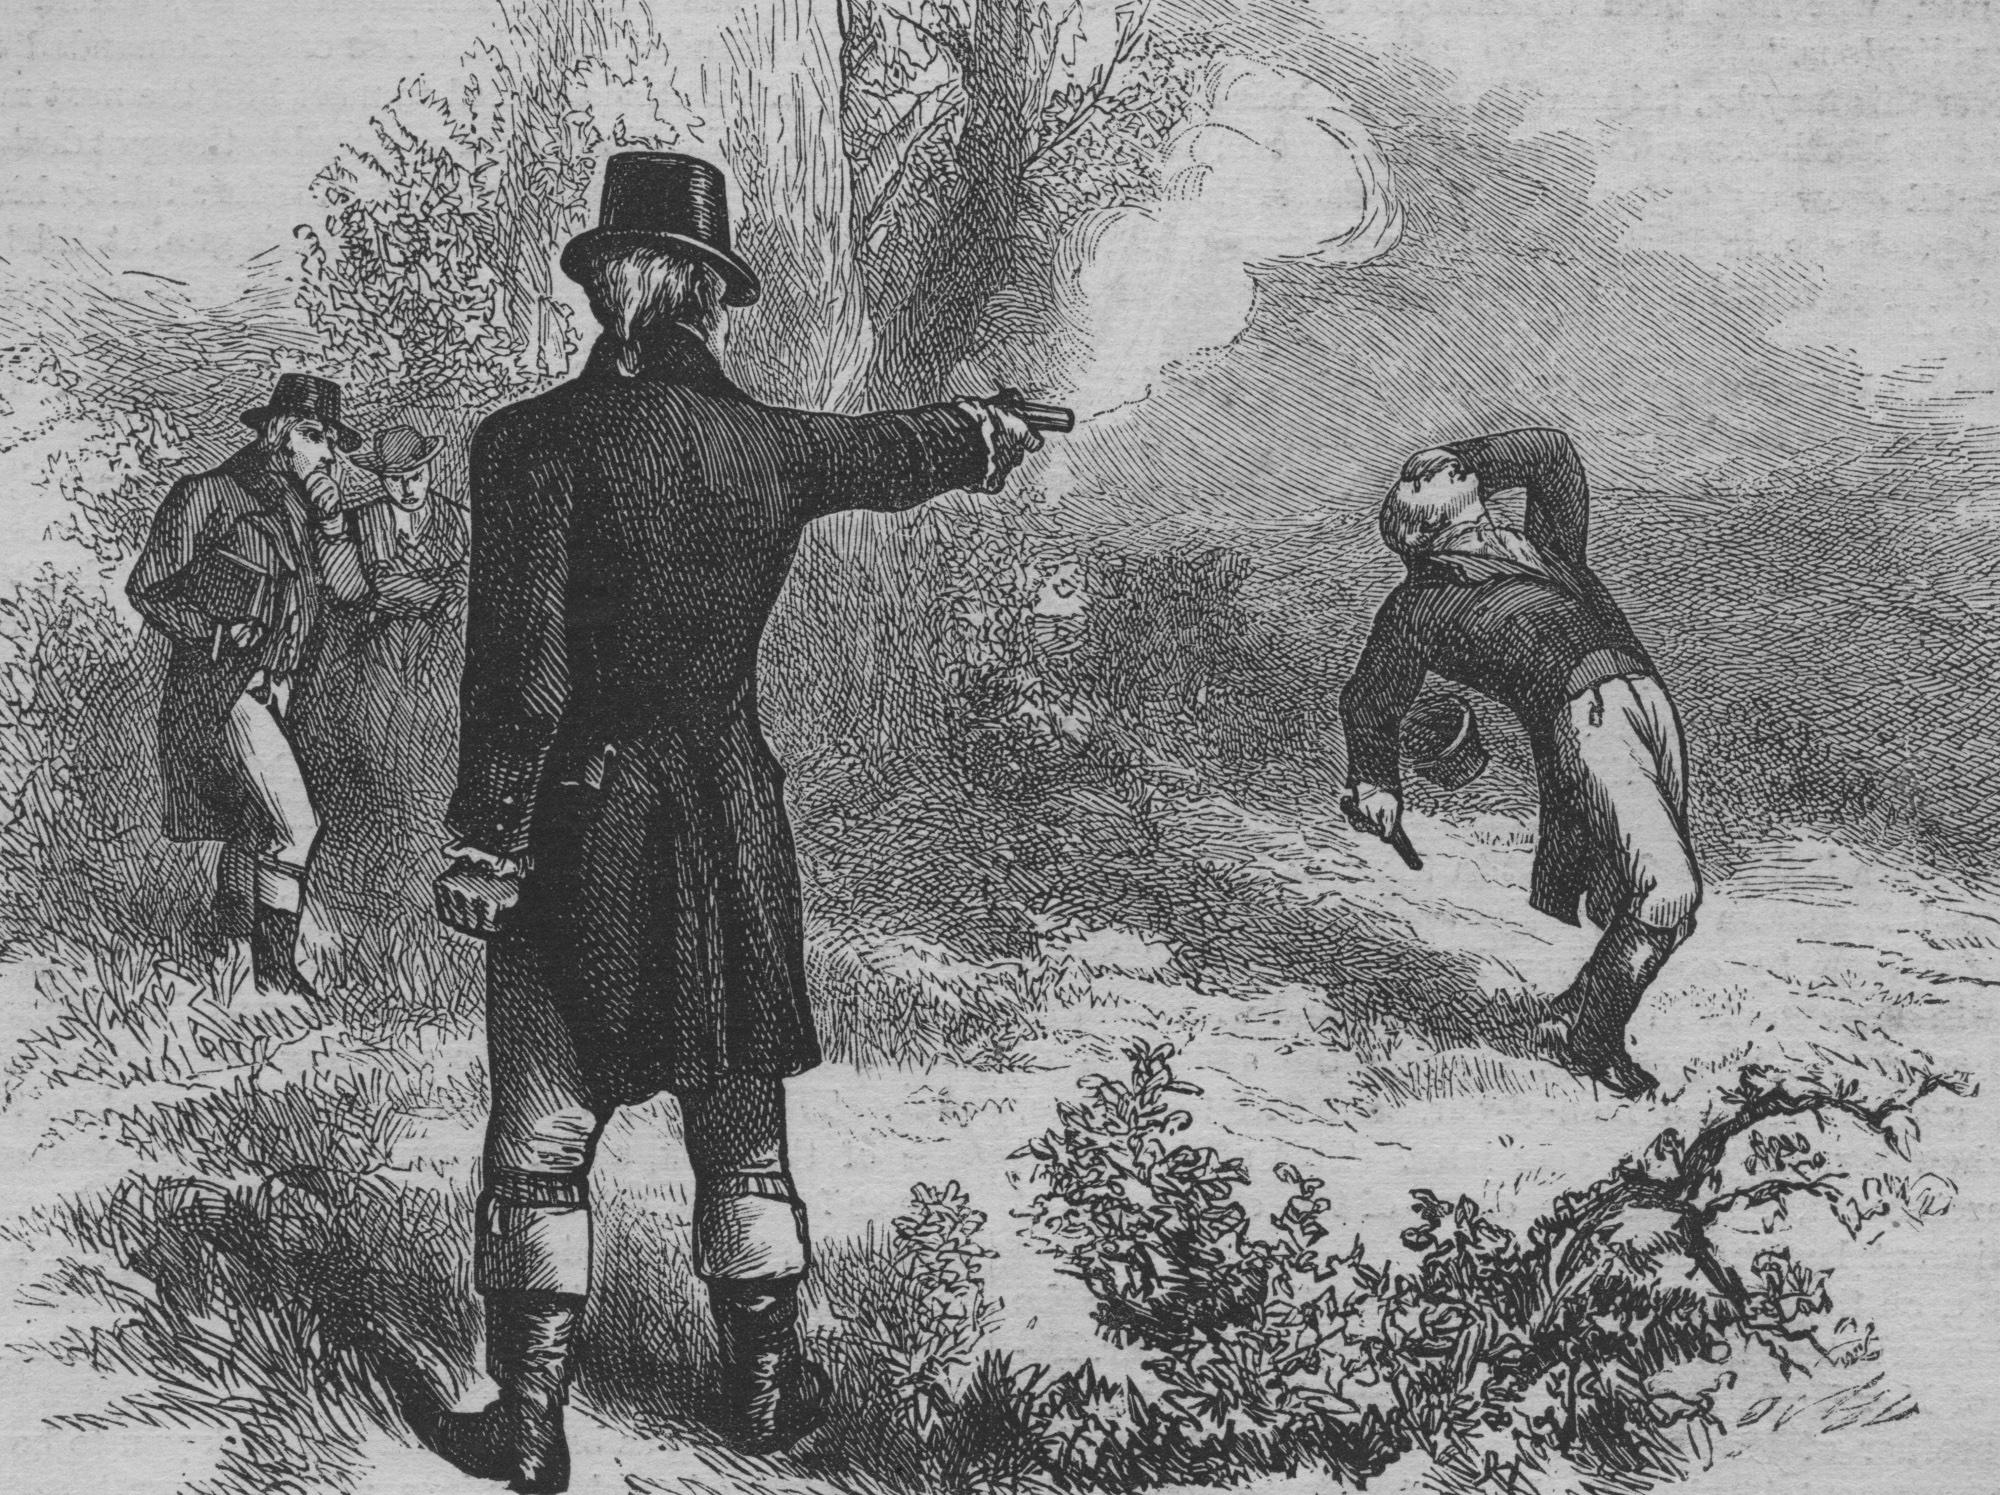 Burr-Hamilton-Duel Image by history1800s.about.com